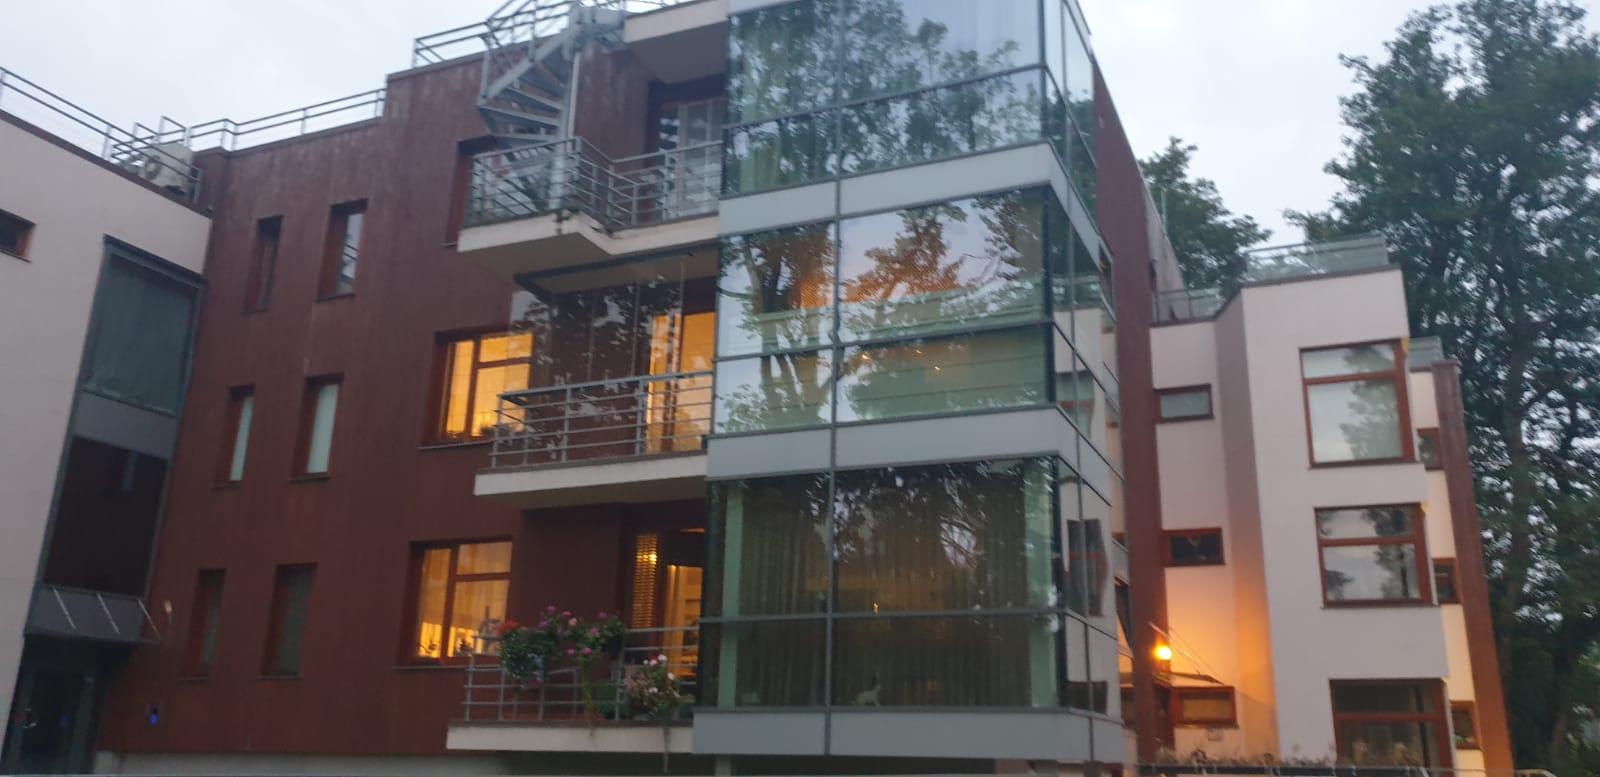 Сдается квартира с террасой в Dubulti